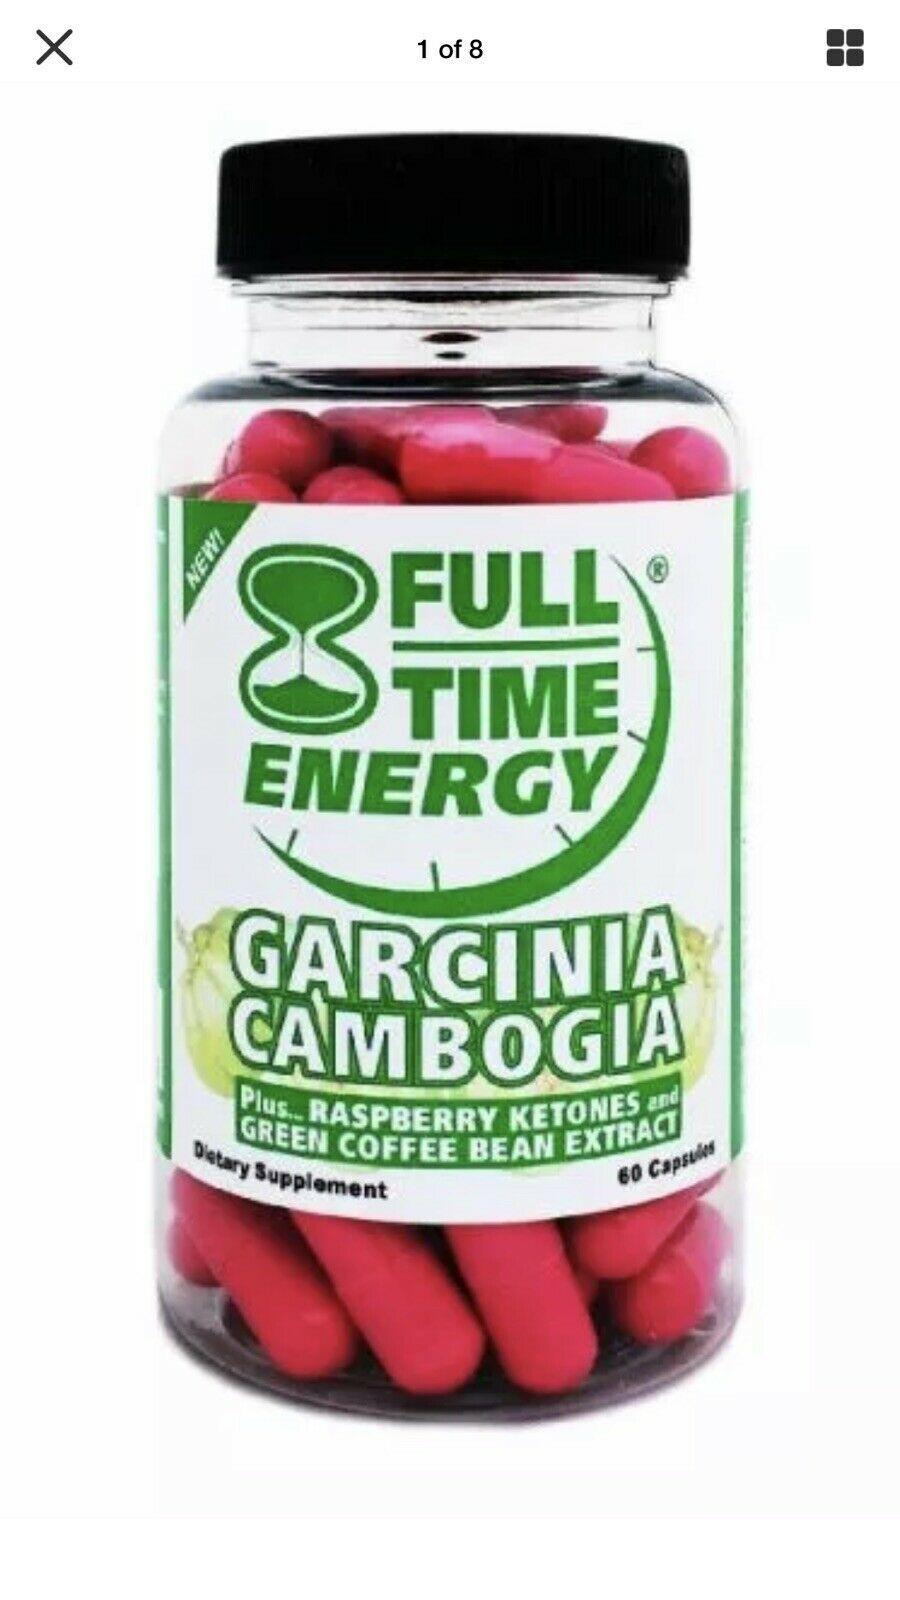 Details About Garcinia Cambogia Plus Raspberry Ketones Green